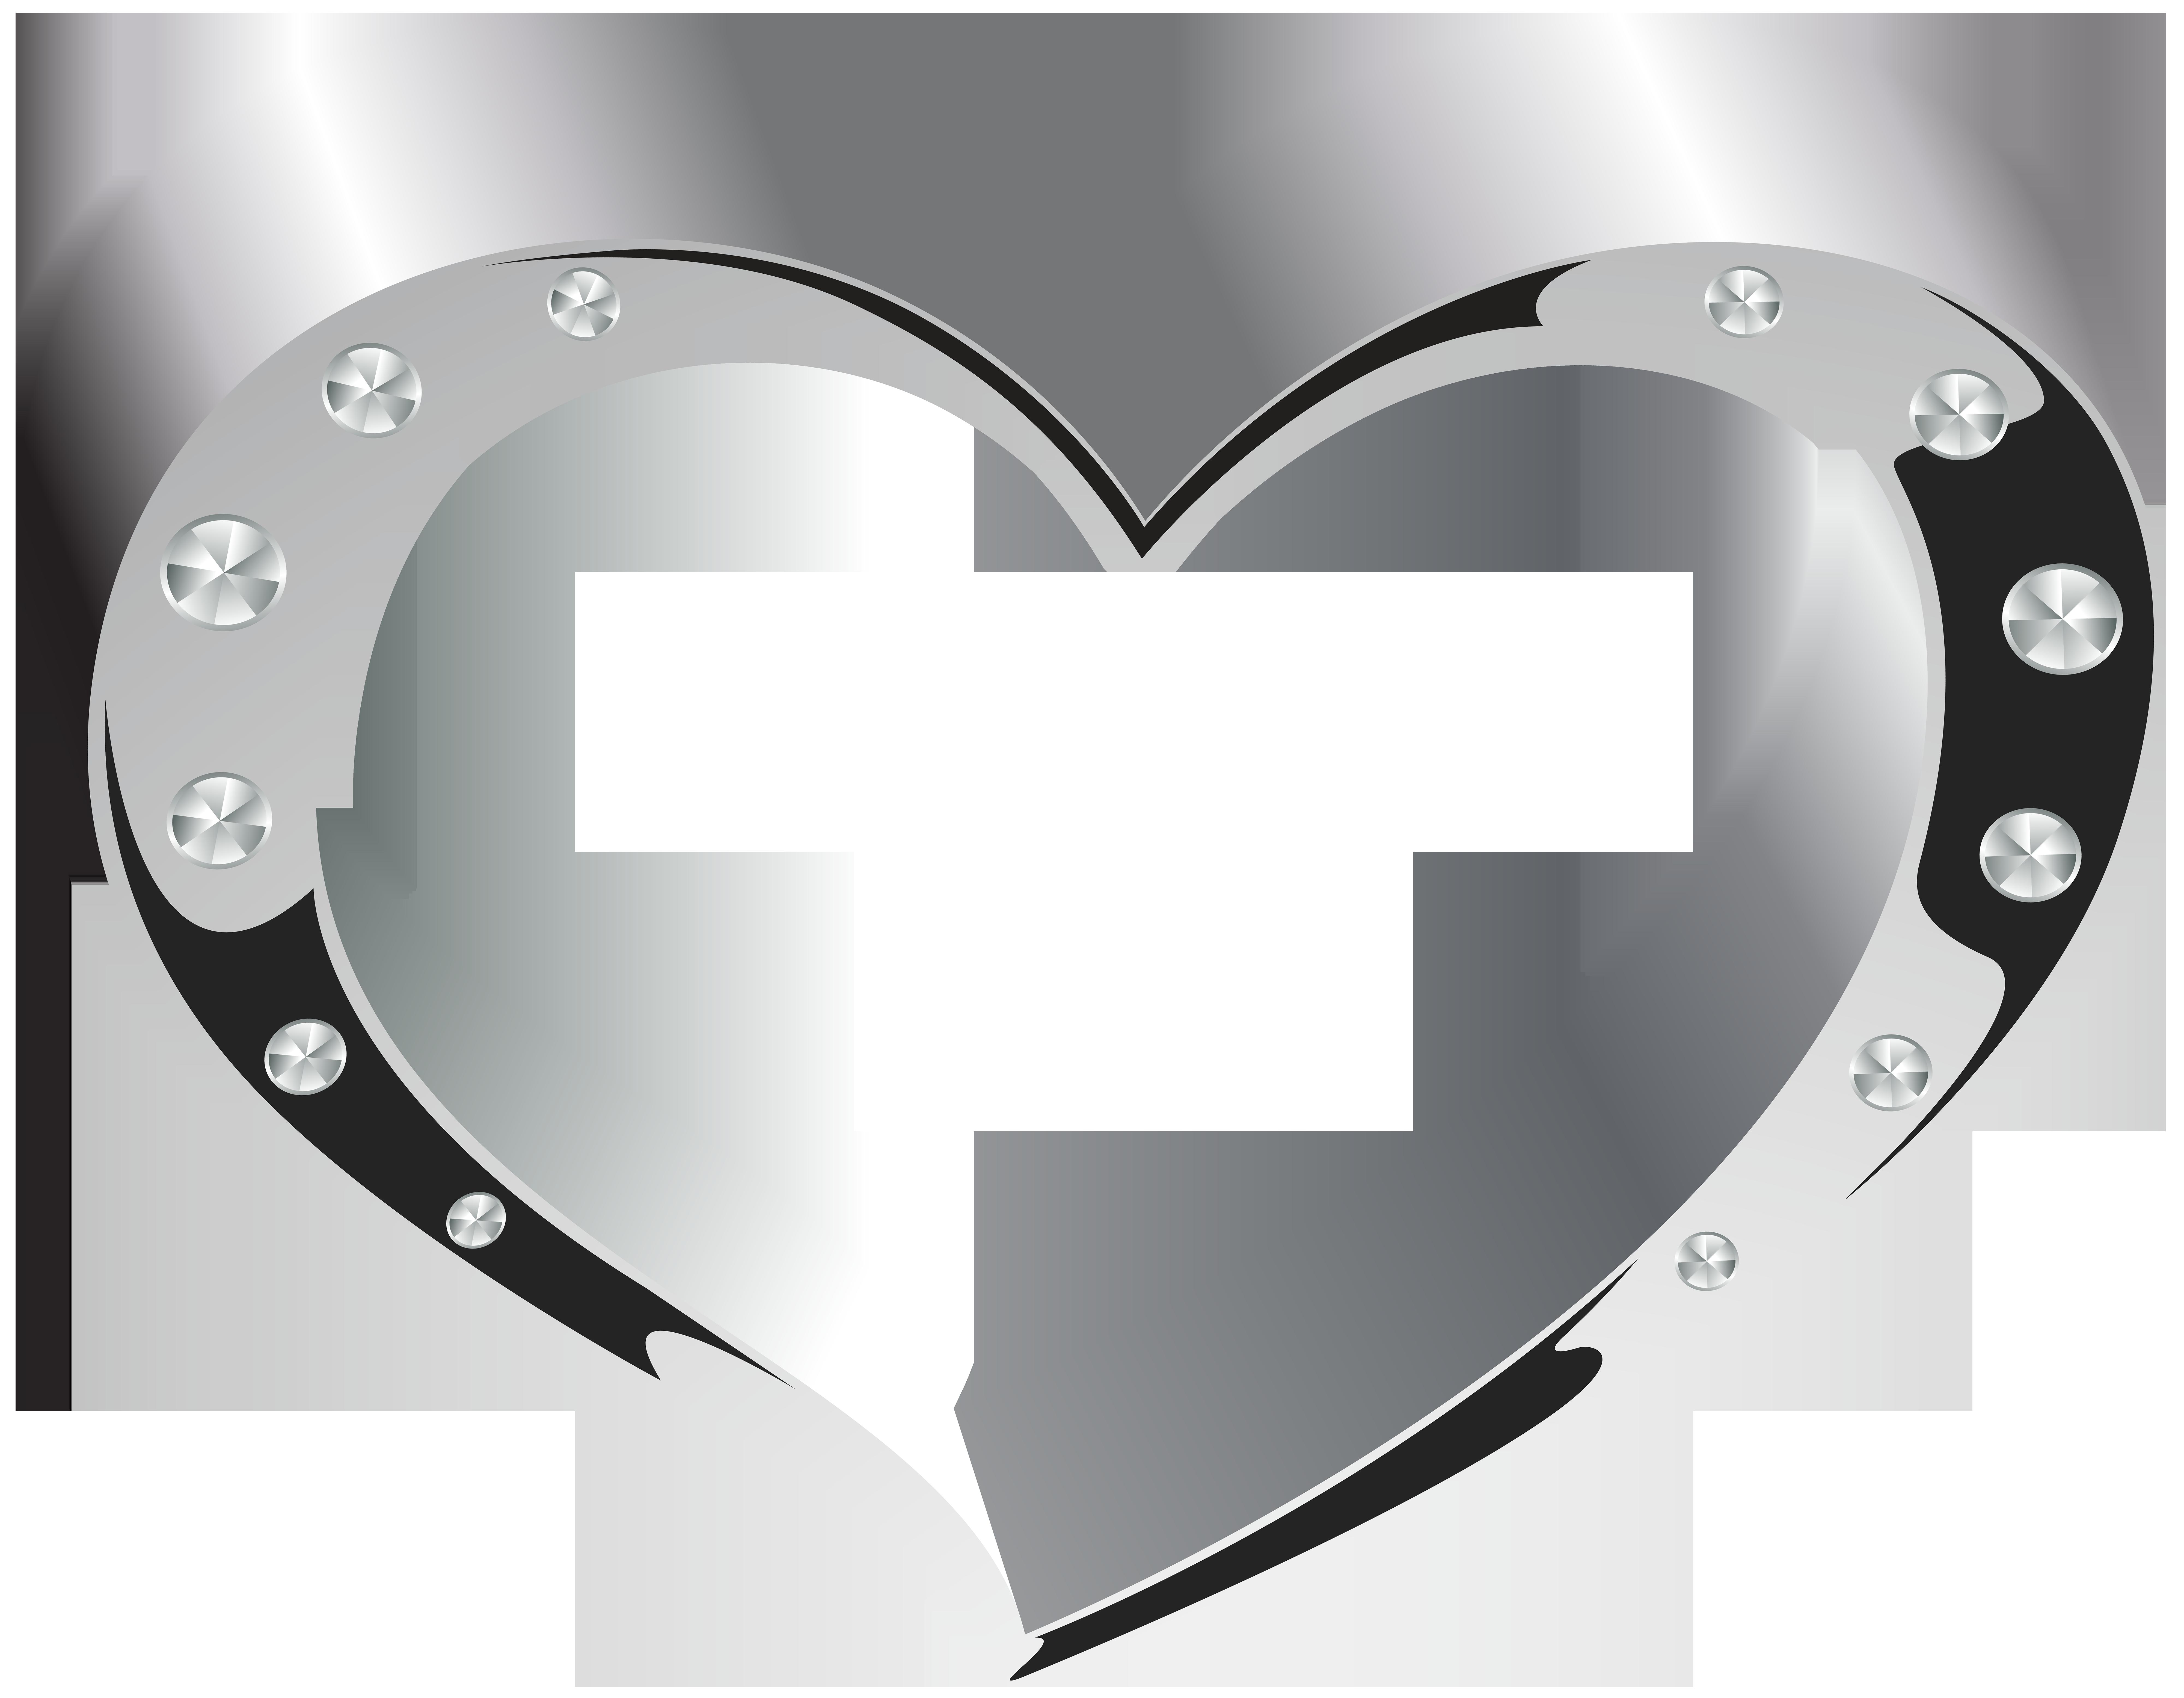 Silver Heart Transparent Clip Art Image.